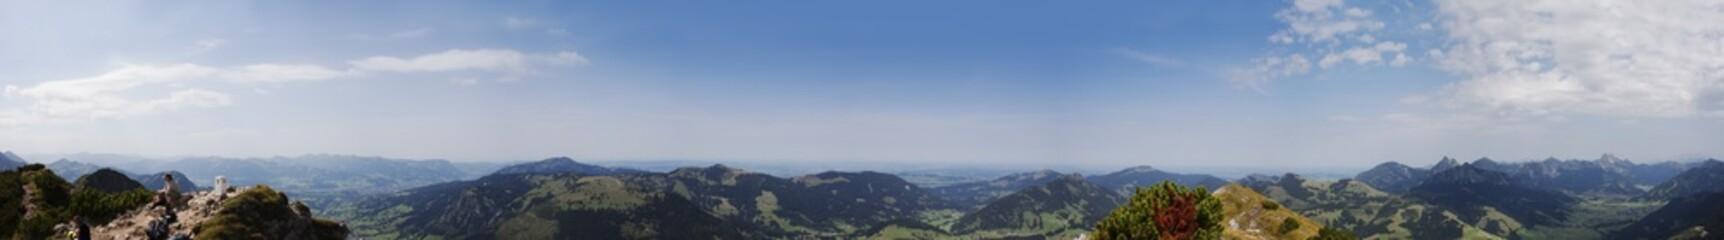 Iseler Gebirge